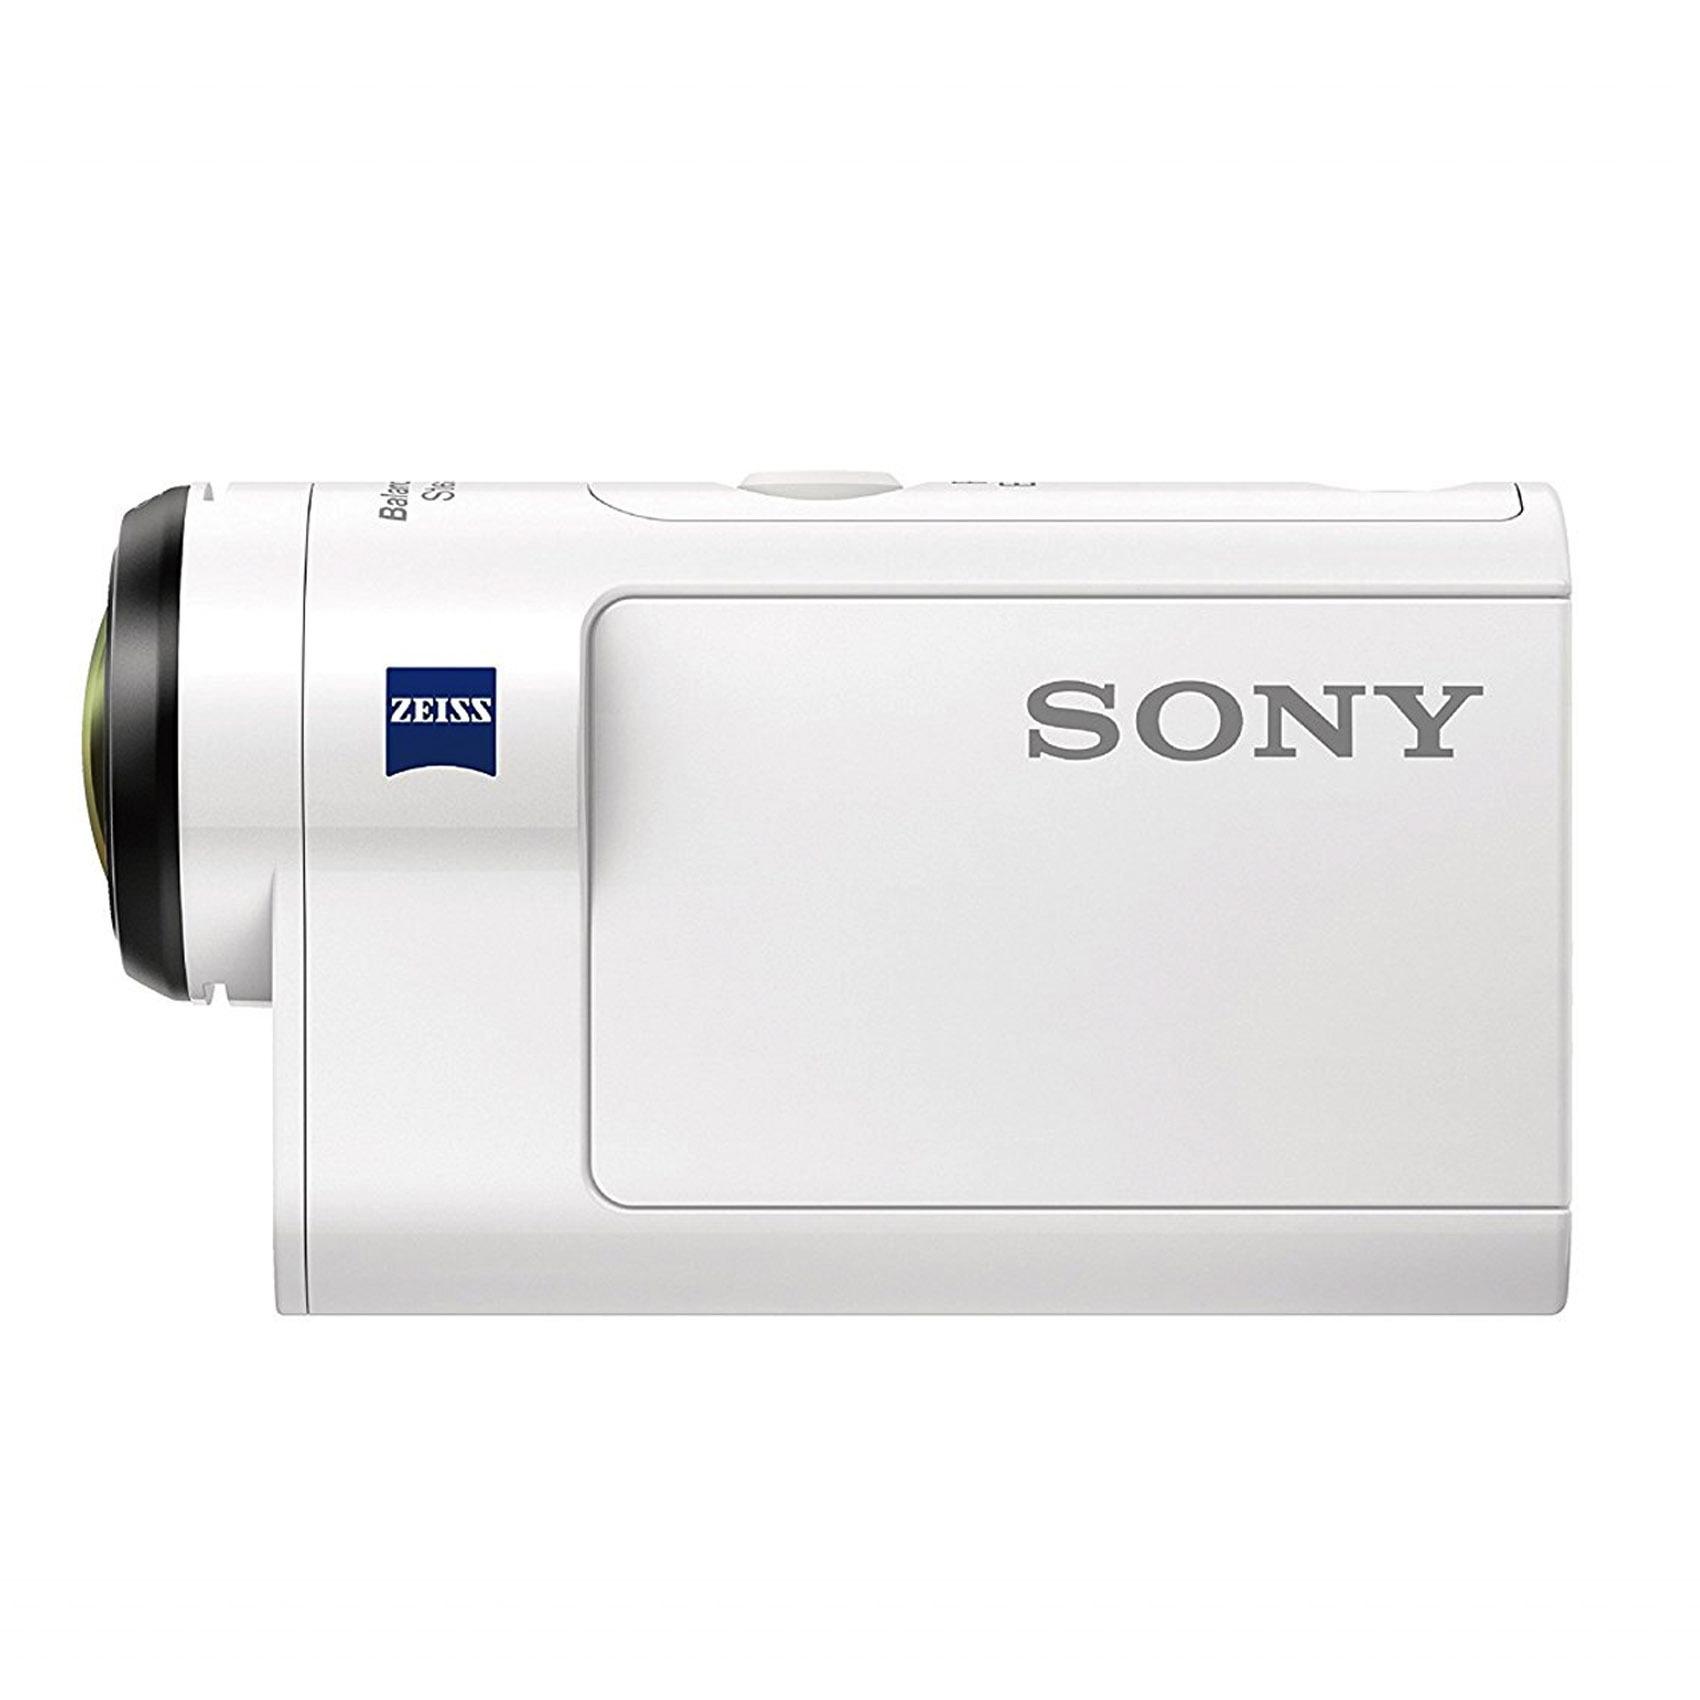 SONY ACTION CAM HDRAS300R